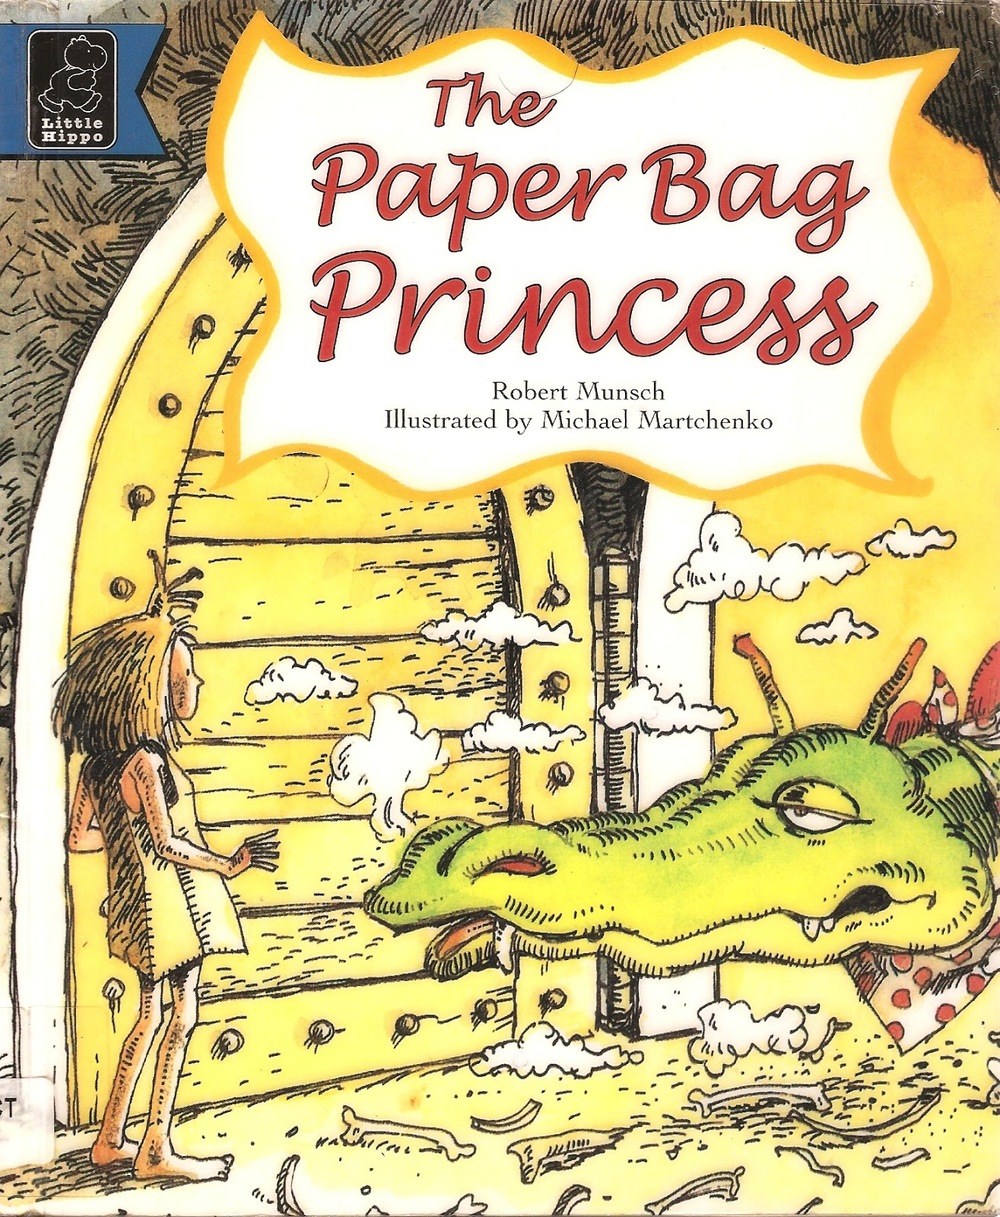 PaperBagPrincess1.jpg